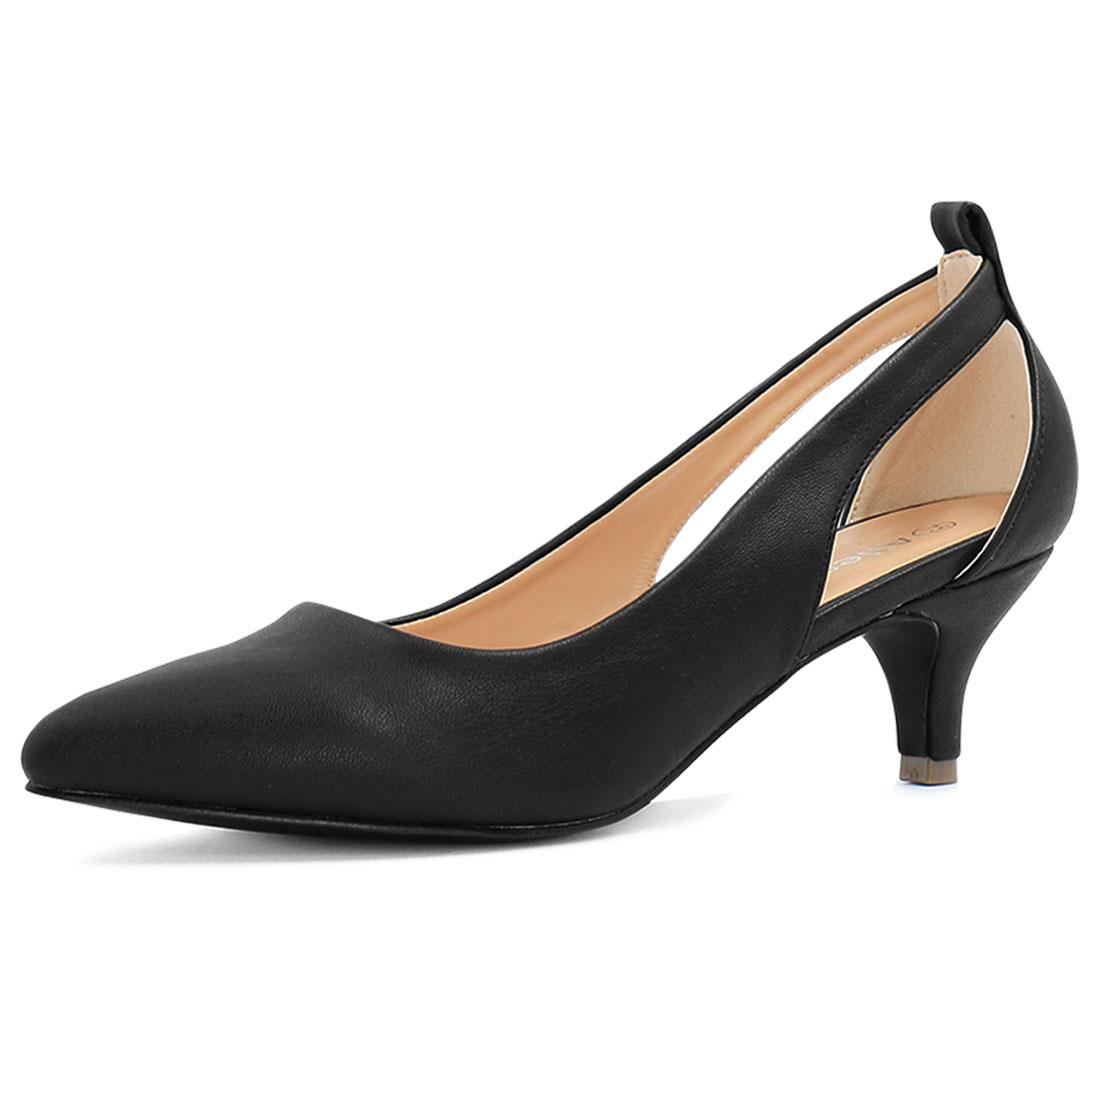 Allegra K Women's Cutout Sides Pointed Toe Kitten Heel Pumps Black US 8